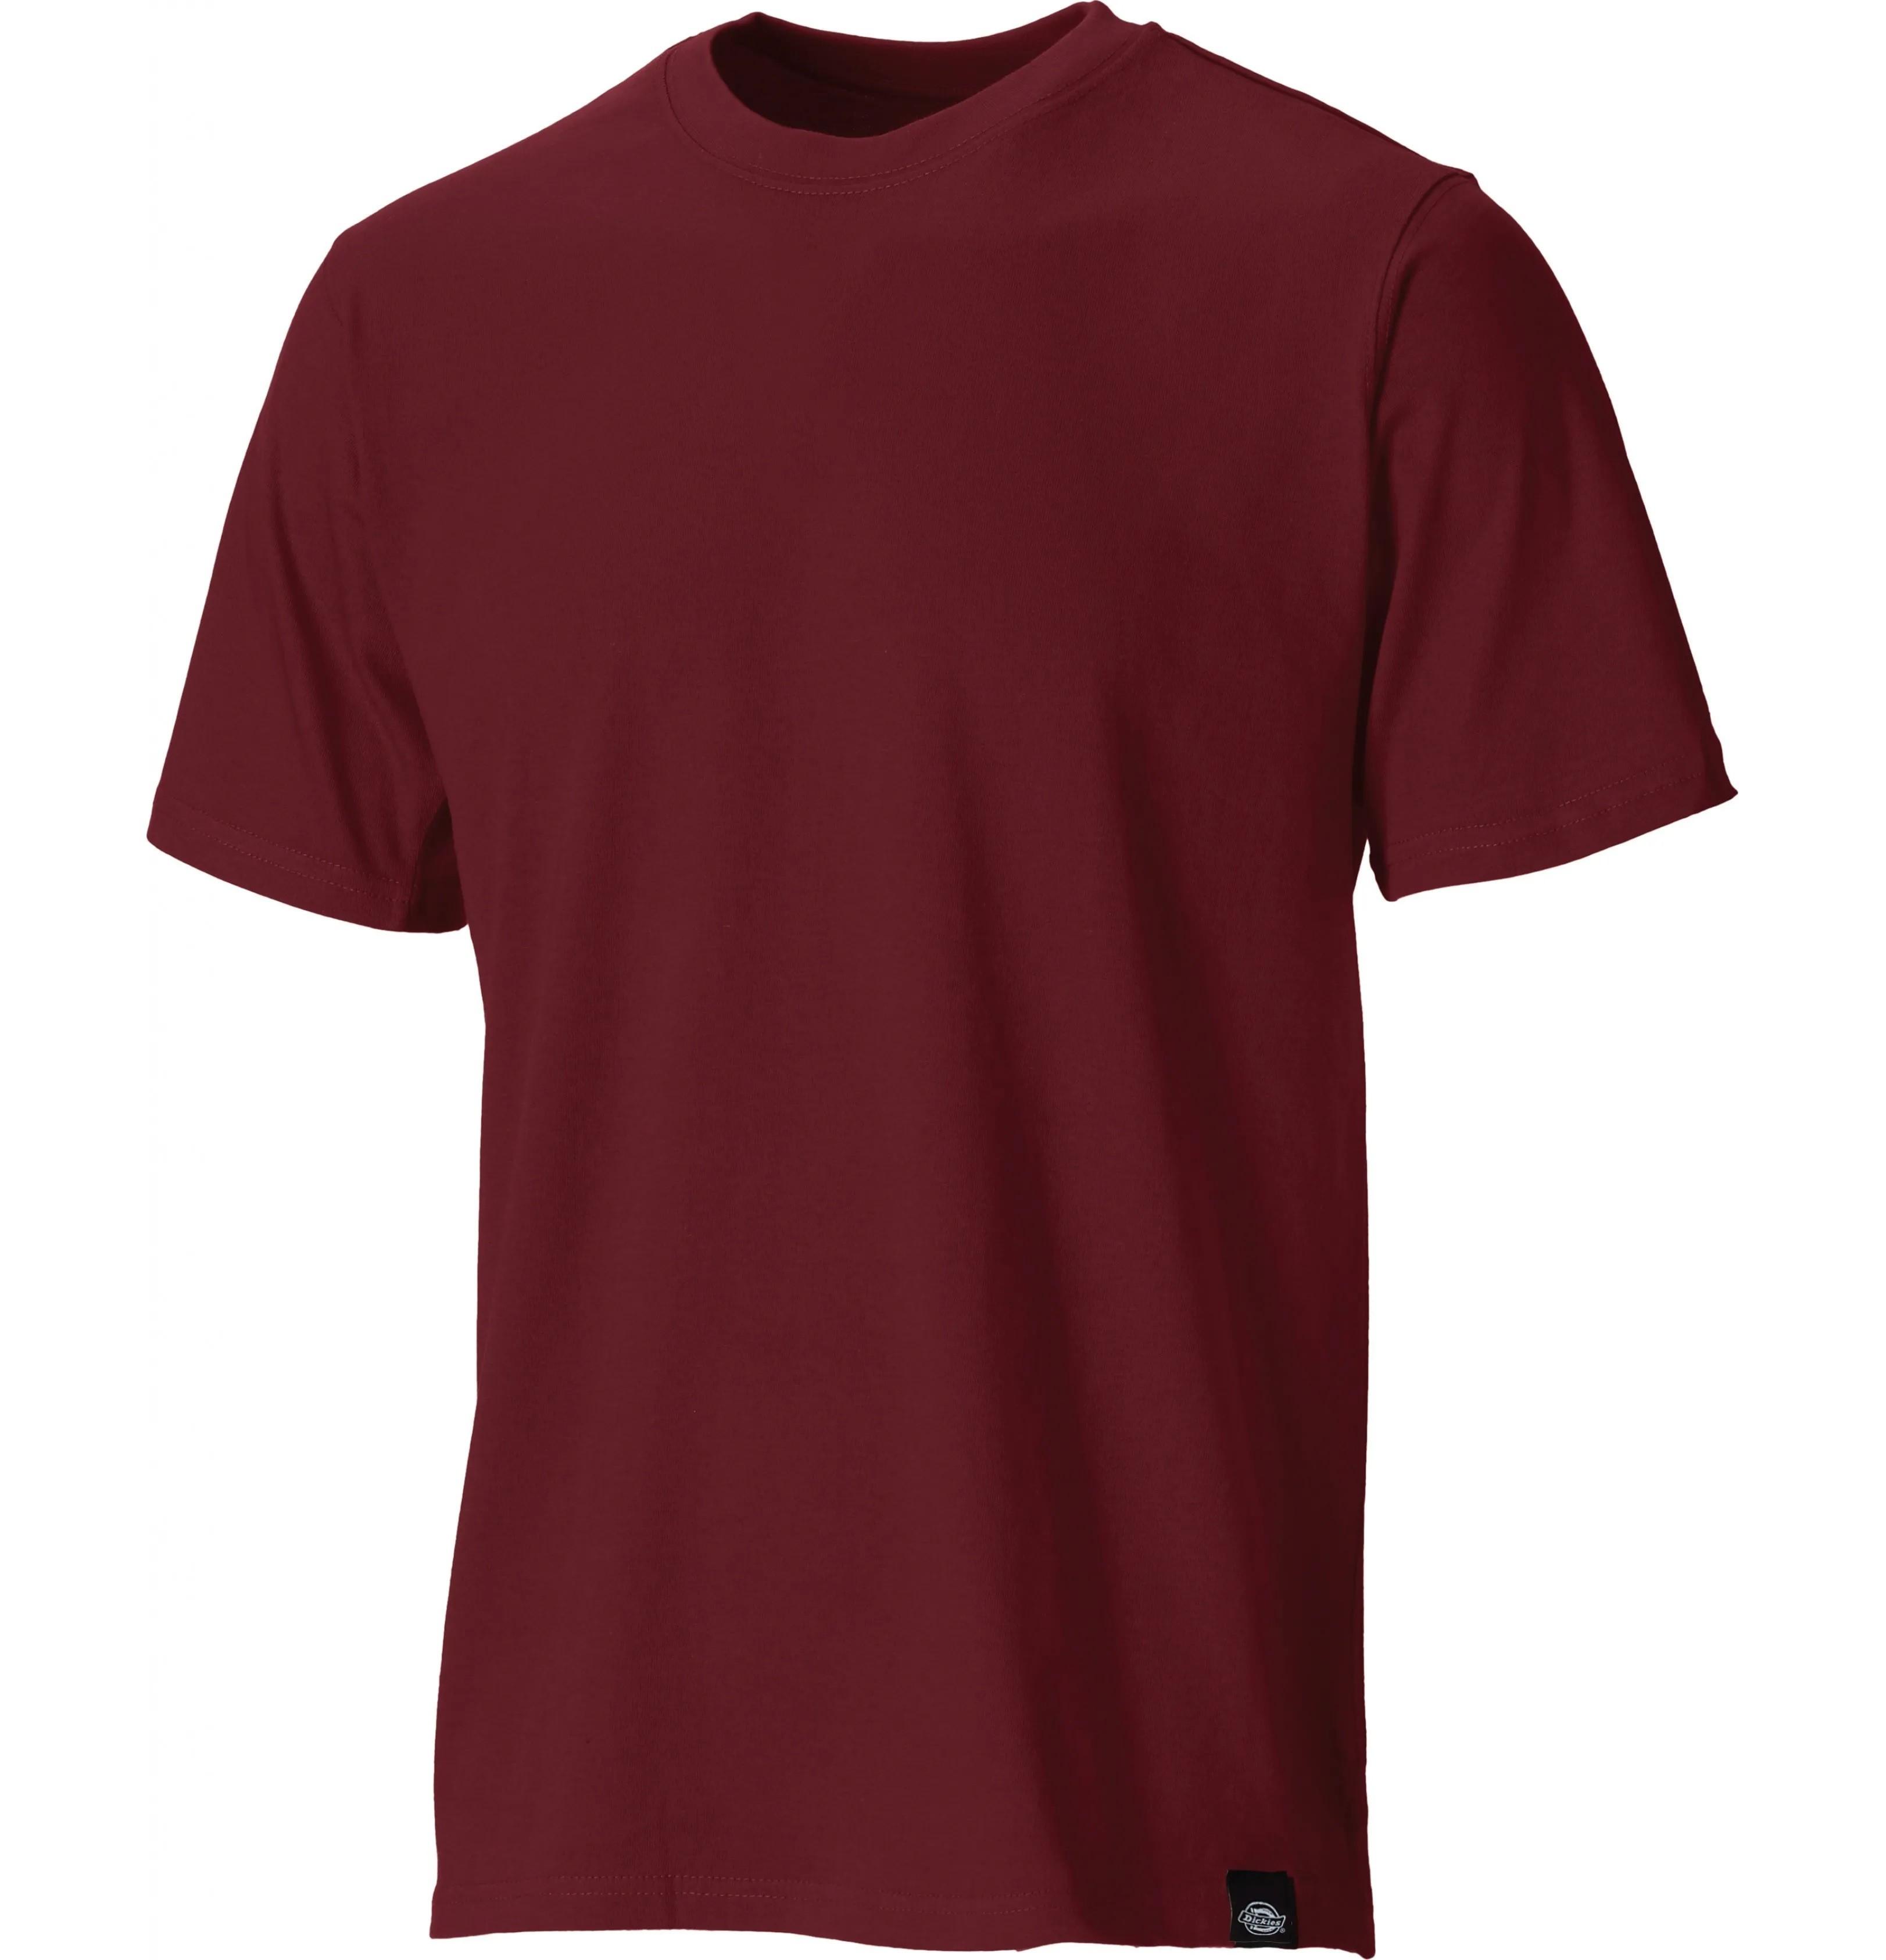 Dickies Cotton T Shirt - Burgundy - XXXL